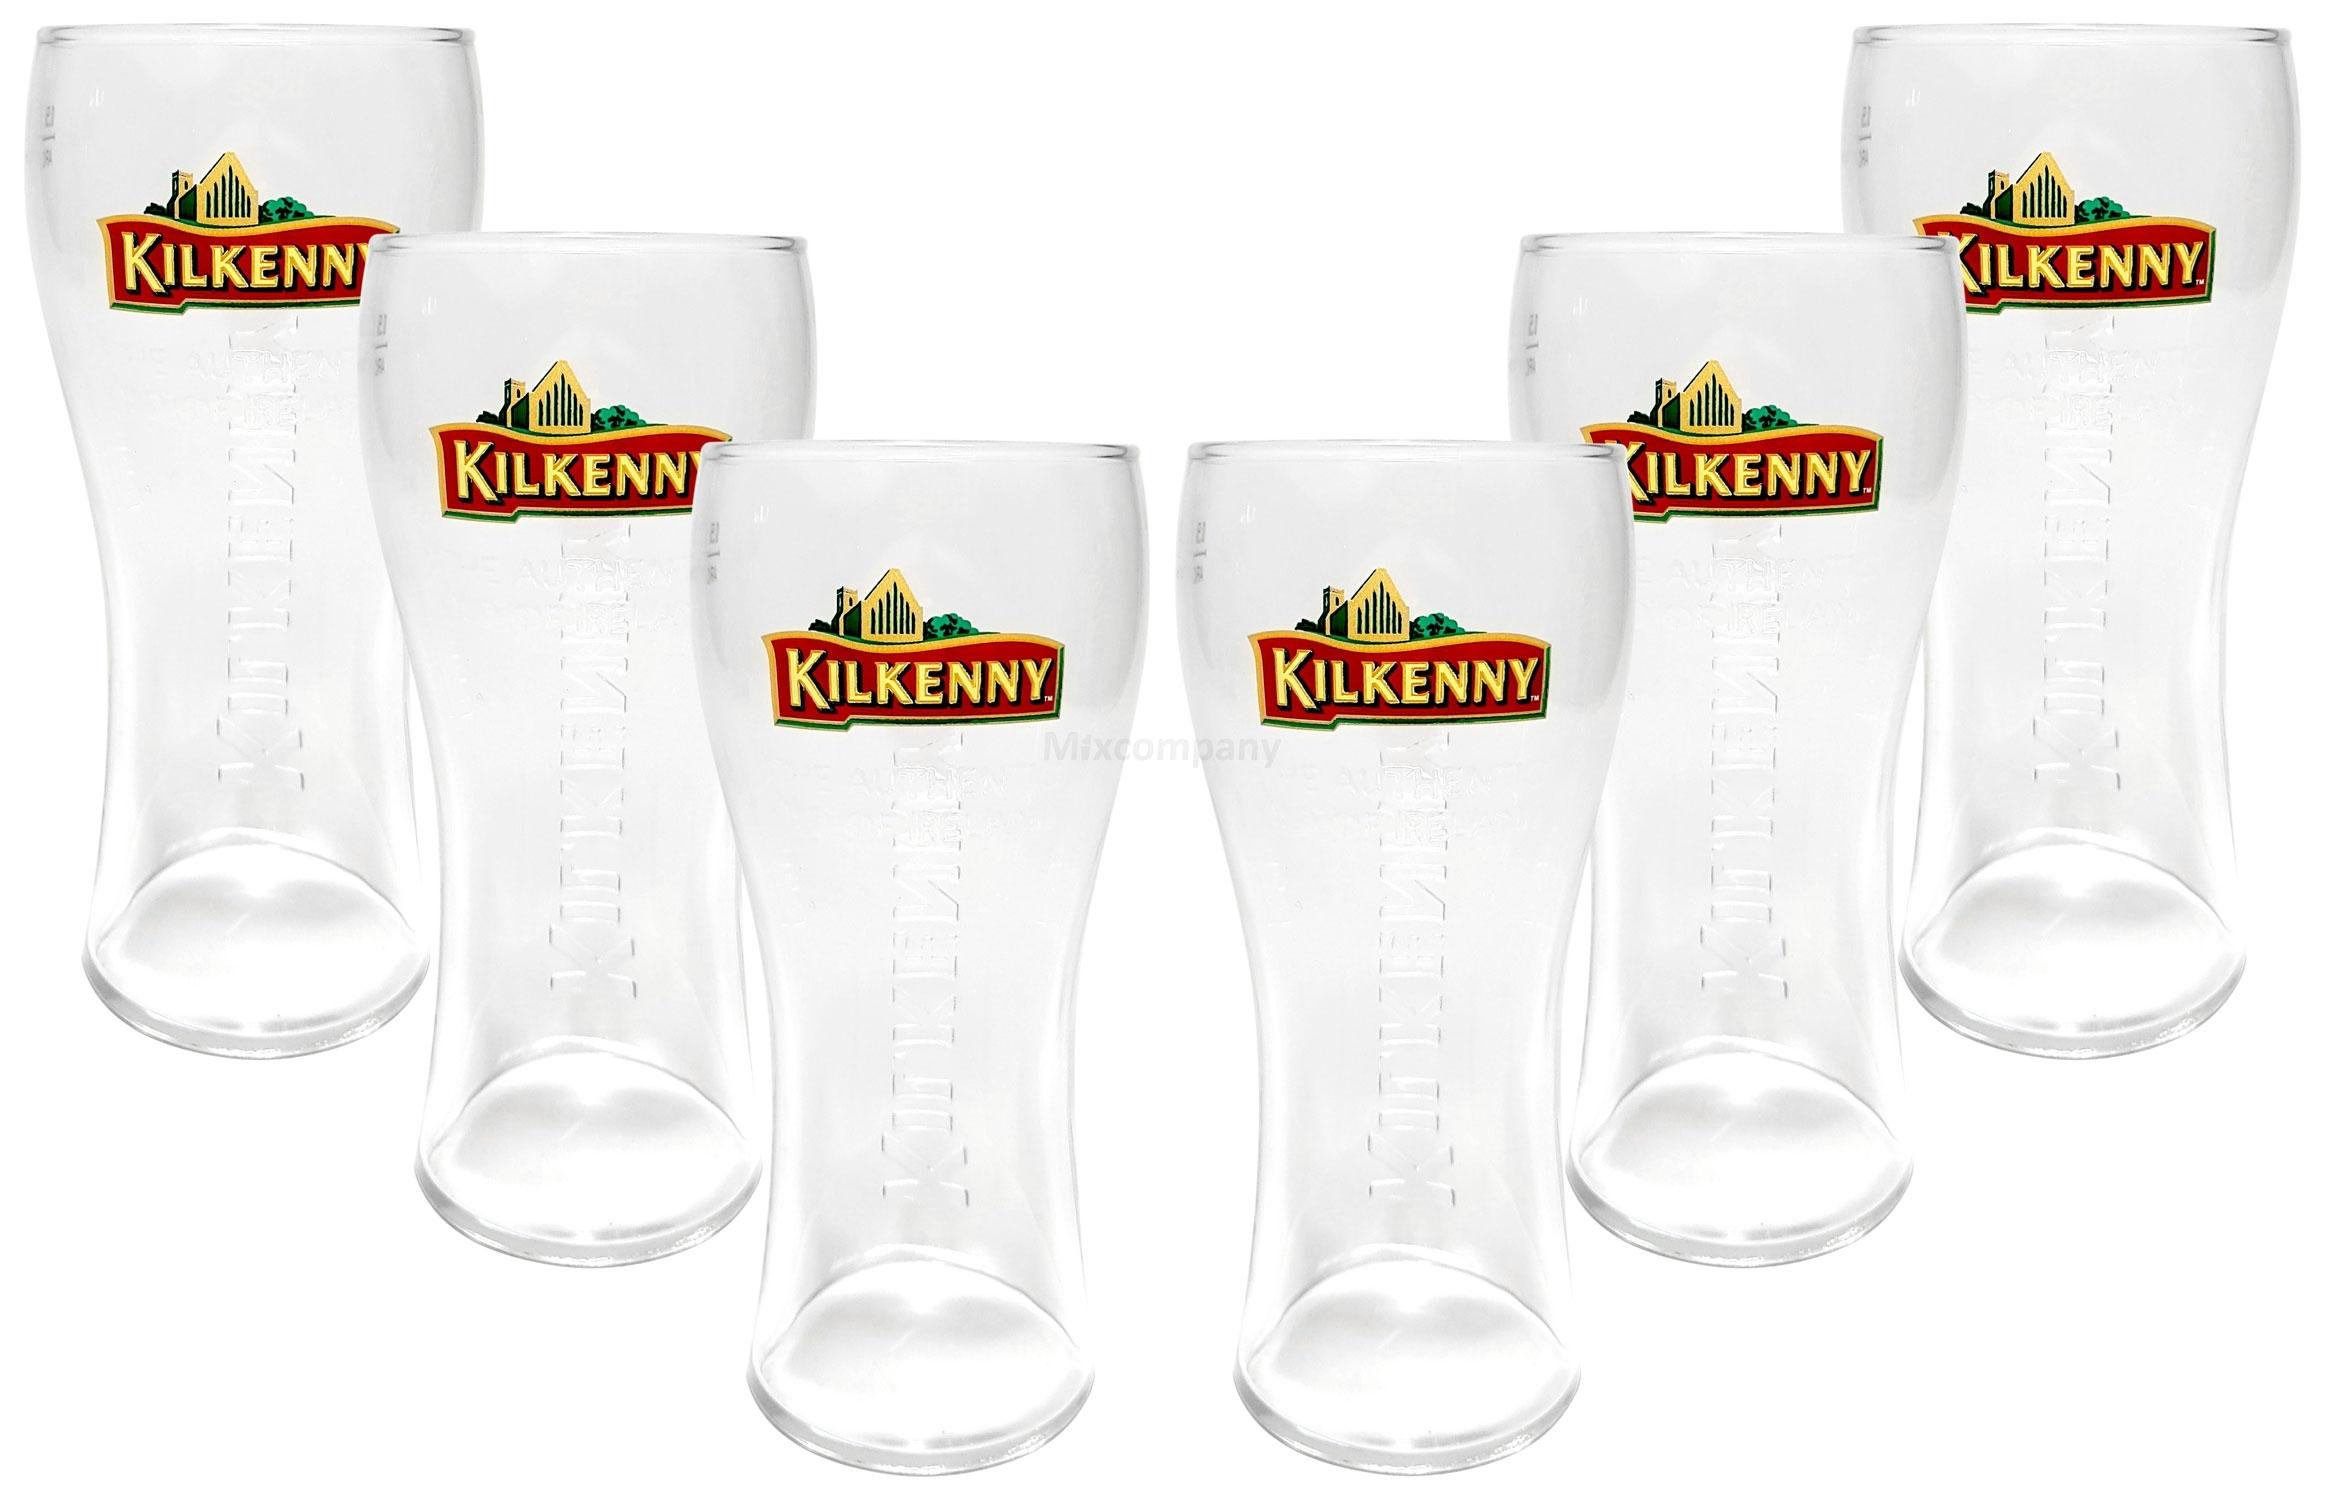 Kilkenny Bierglas Glas Gläser-Set - 6x Biergläser